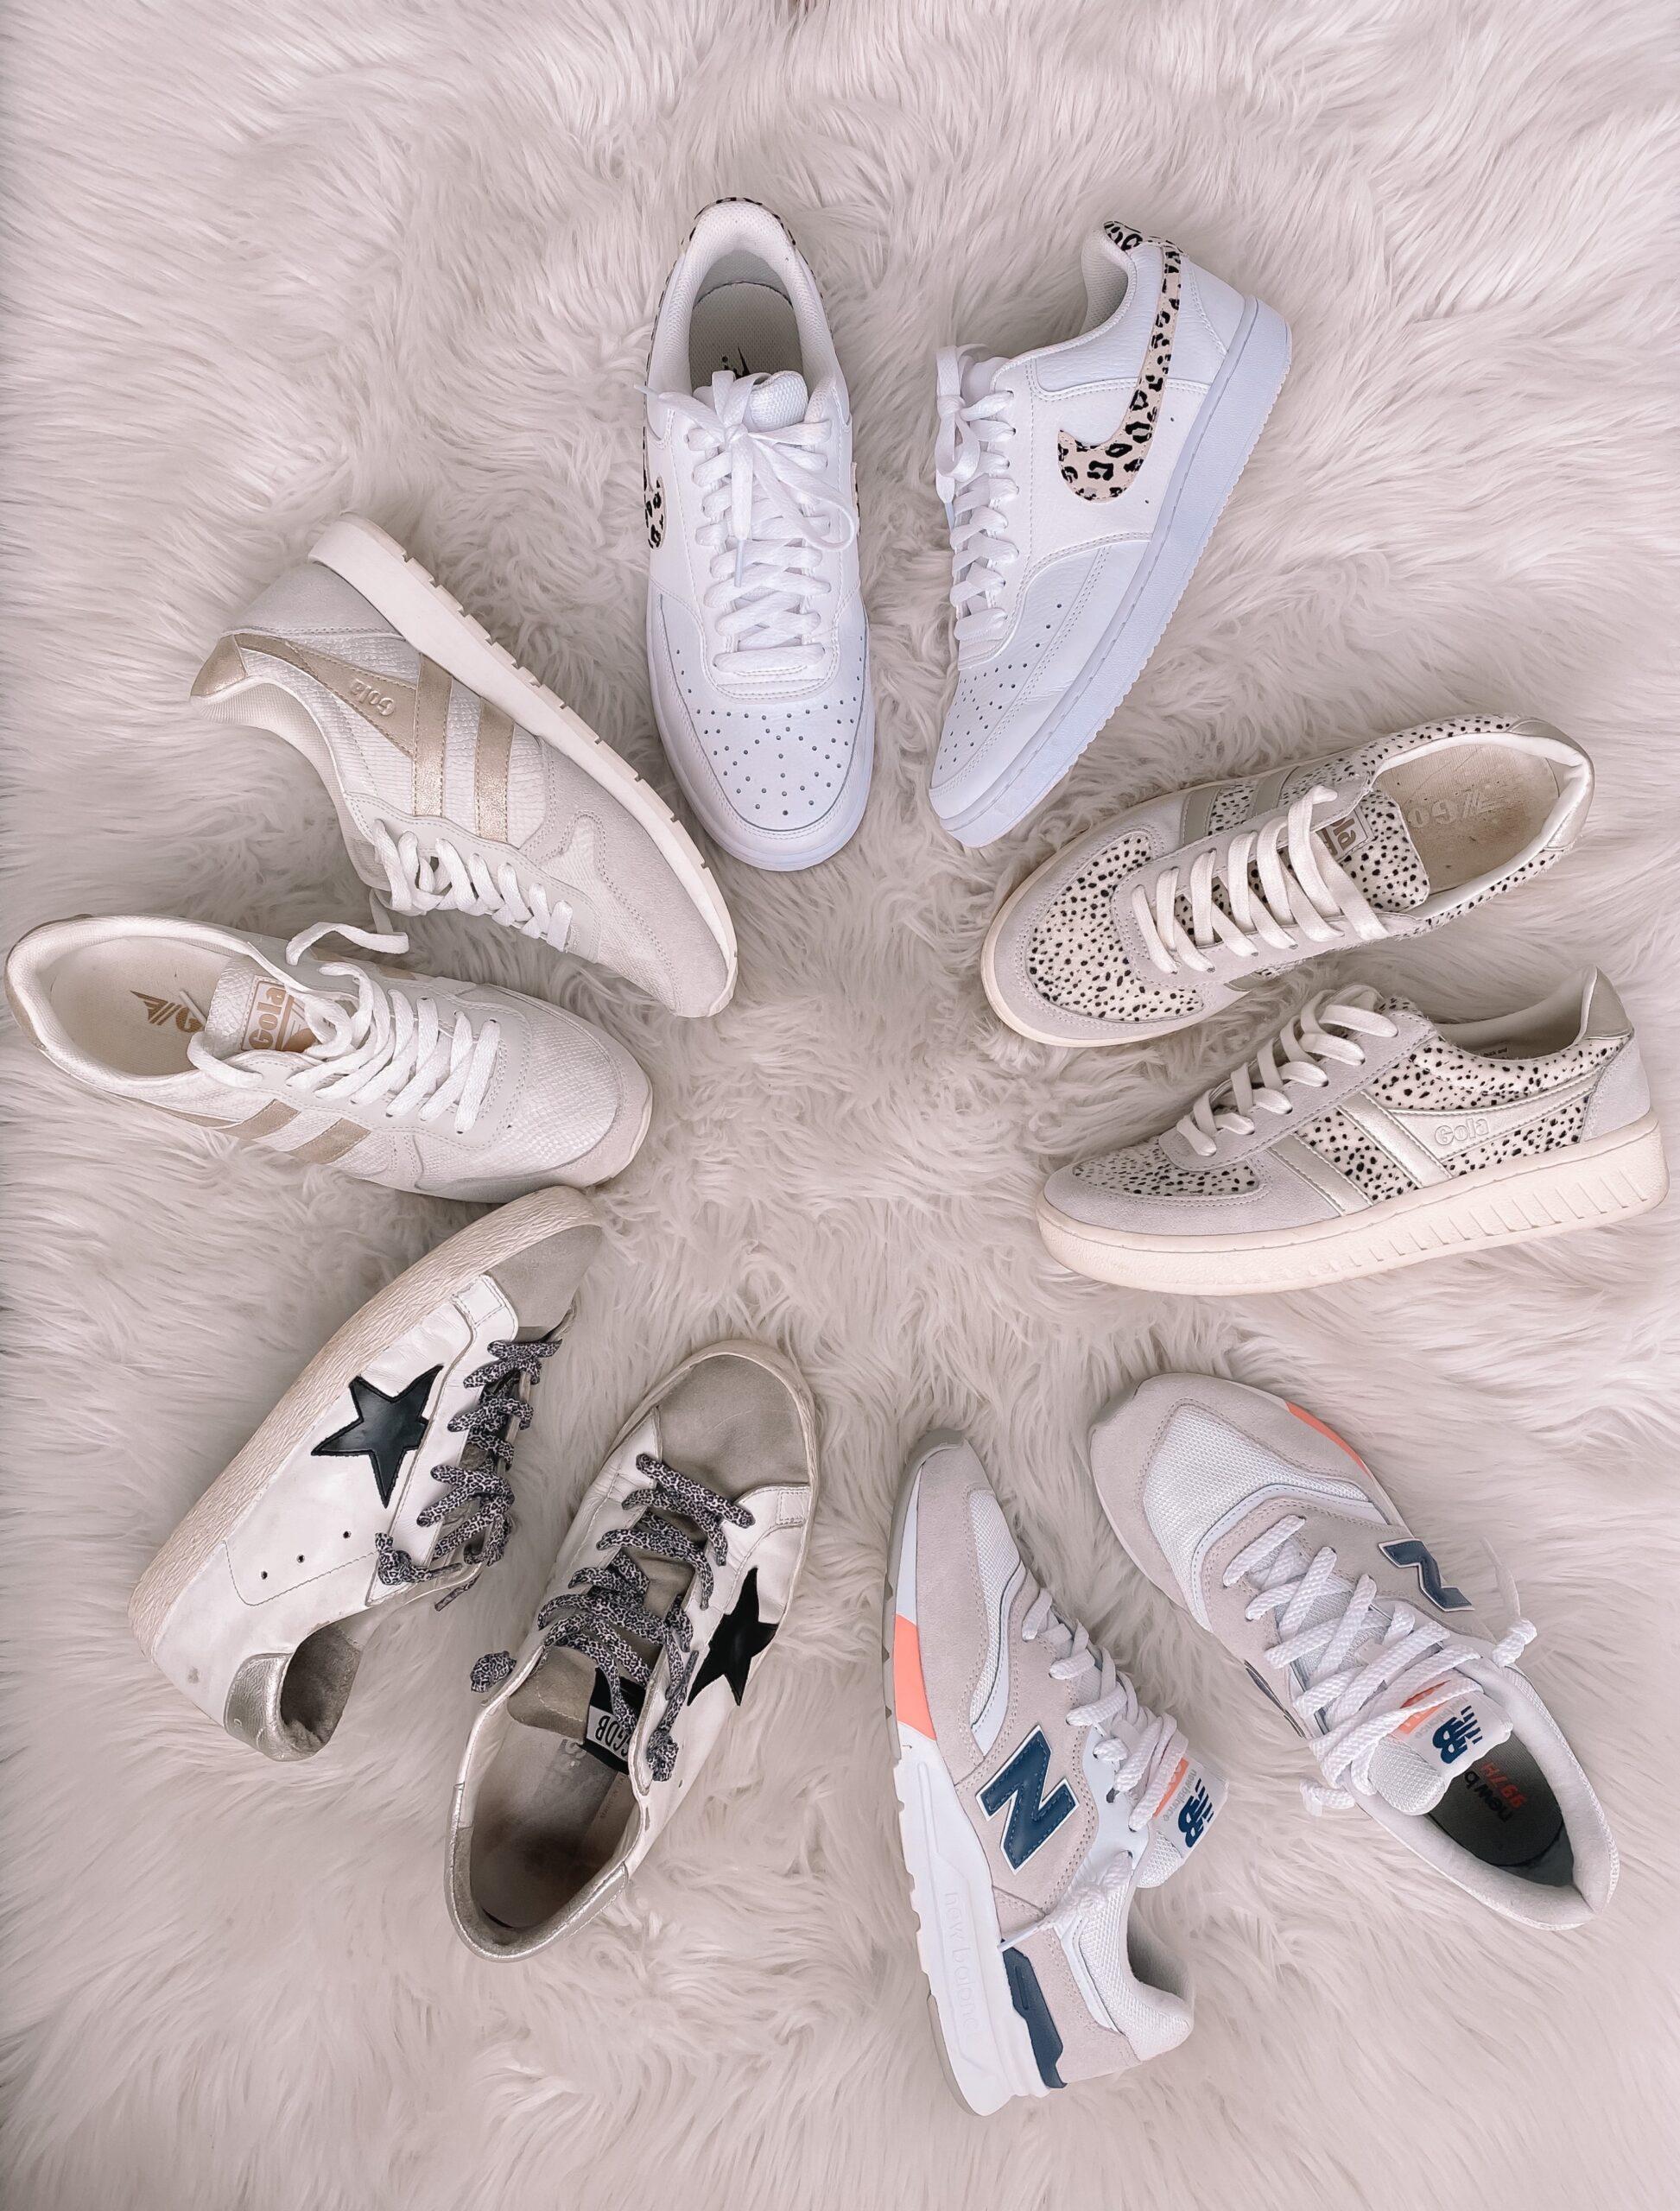 causal sneakers, spring sneakers, nike, golden goose, new balance, gola